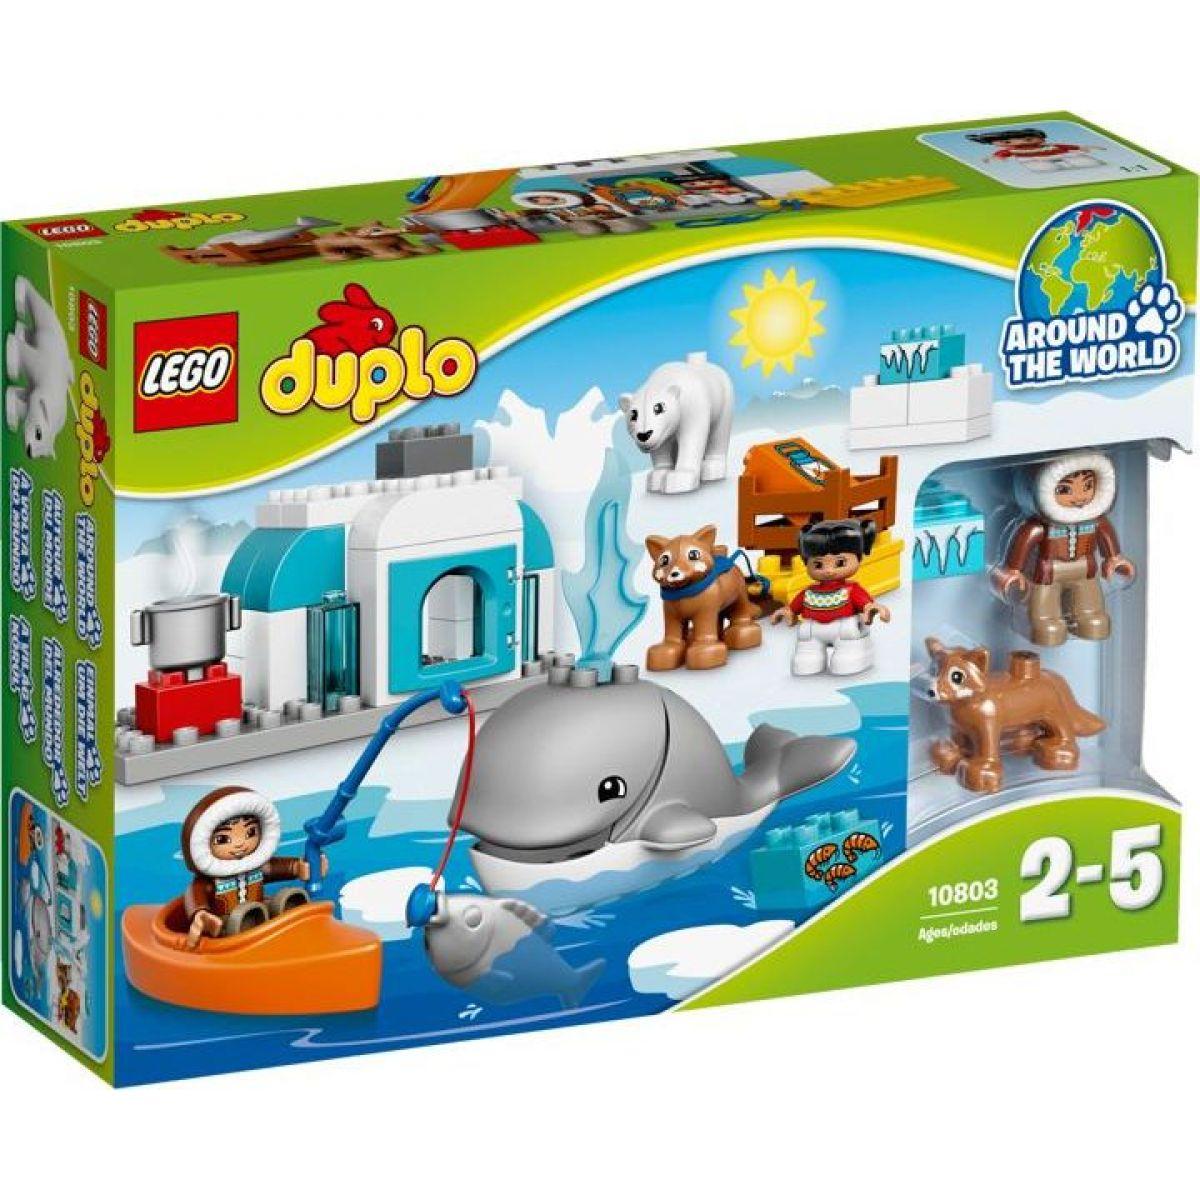 LEGO DUPLO 10803 Arktida